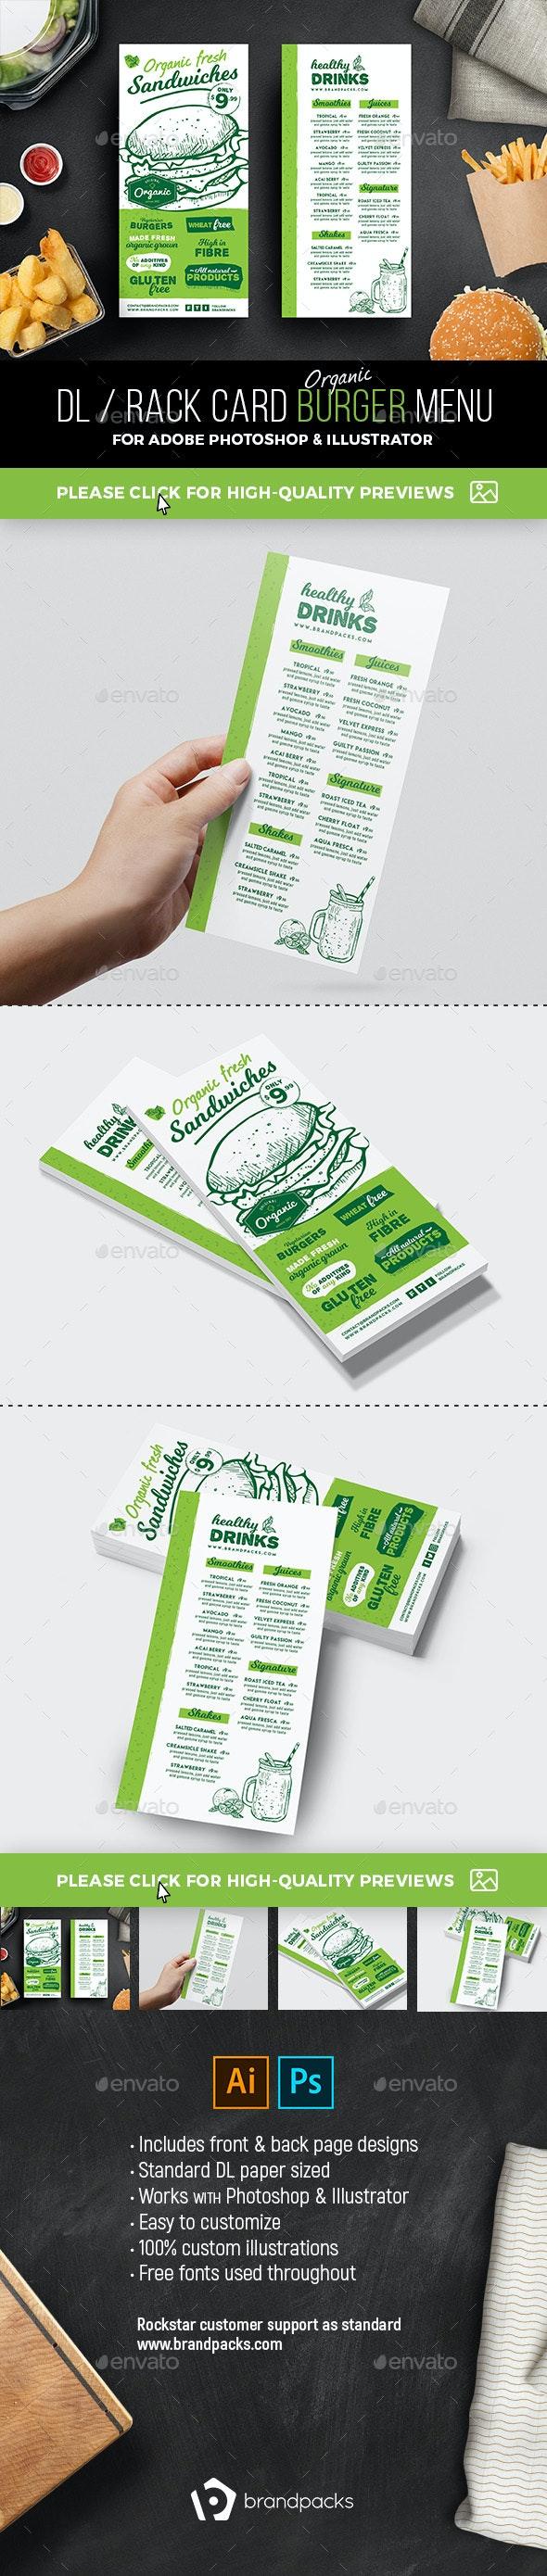 DL Rack Card Burger Menu - Food Menus Print Templates